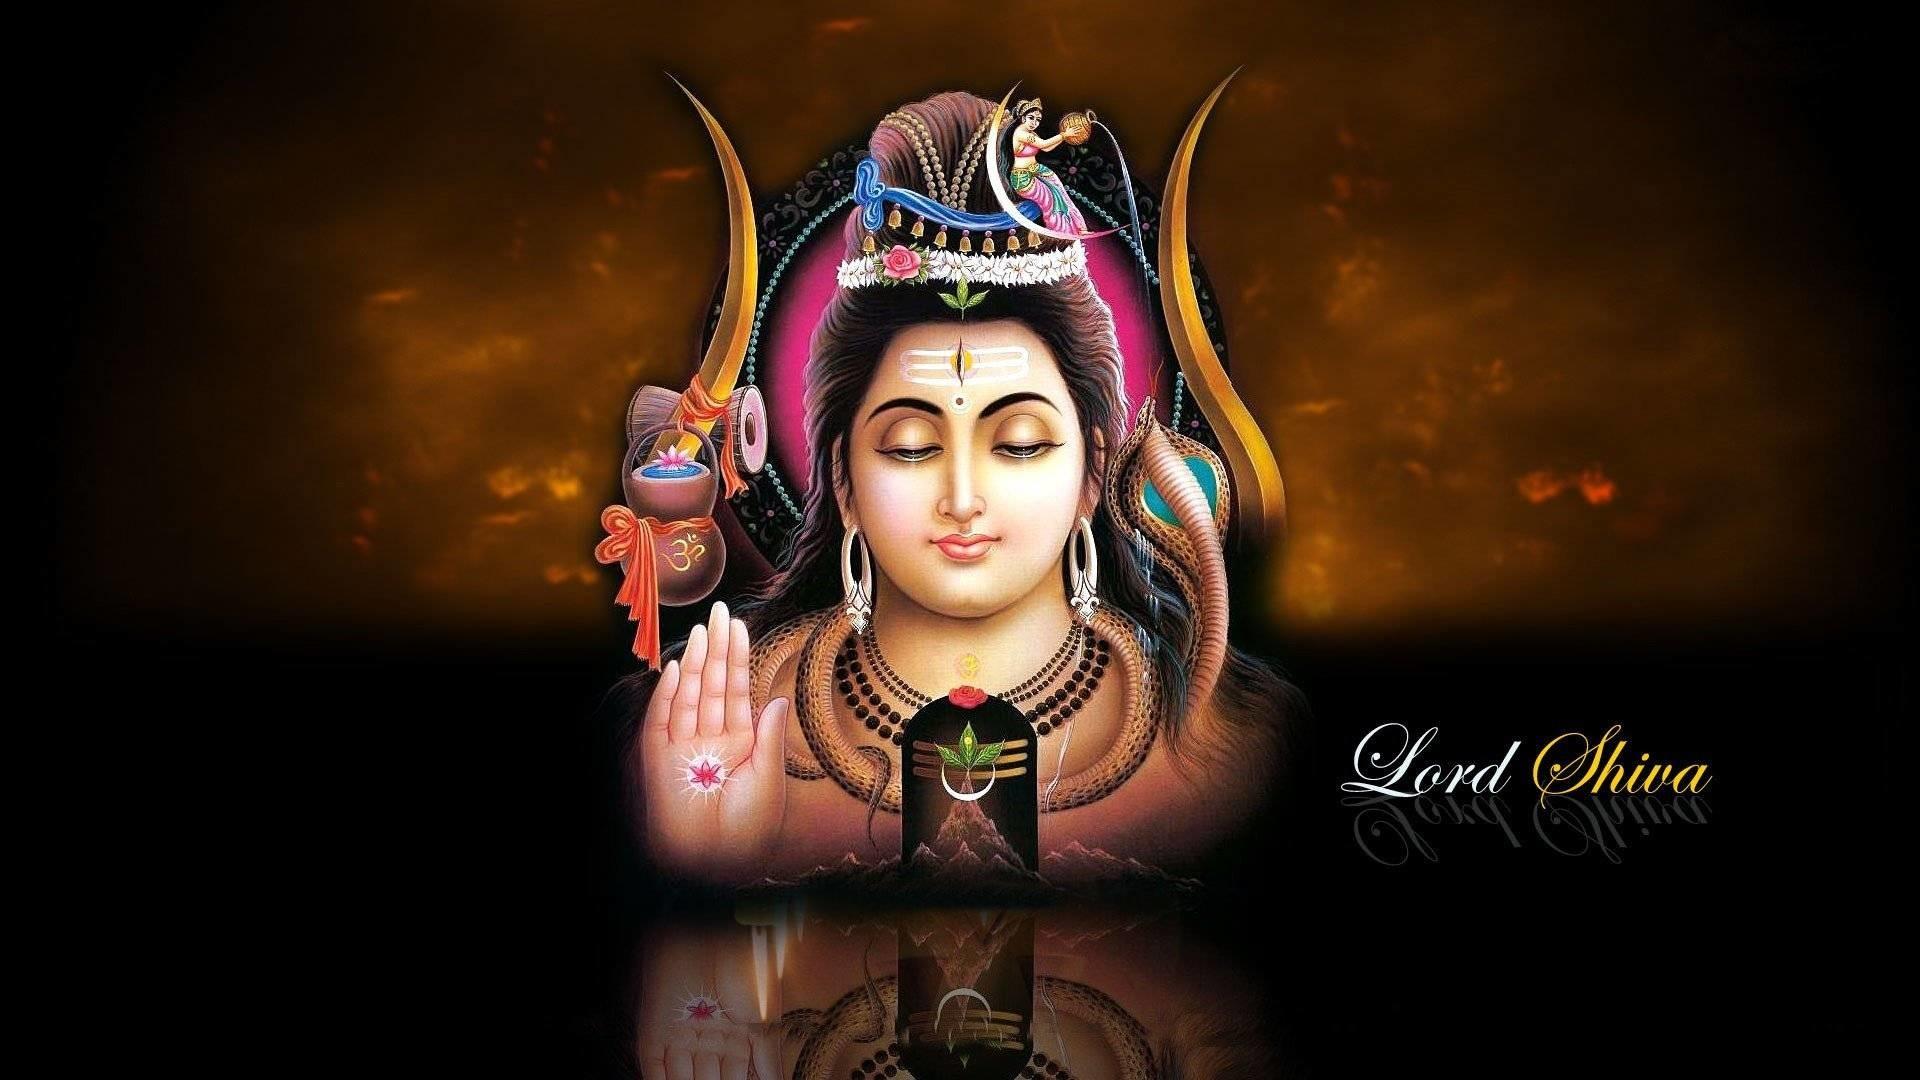 High Resolution Lord Shiva Wallpapers HD – SiWallpaperHD 23180